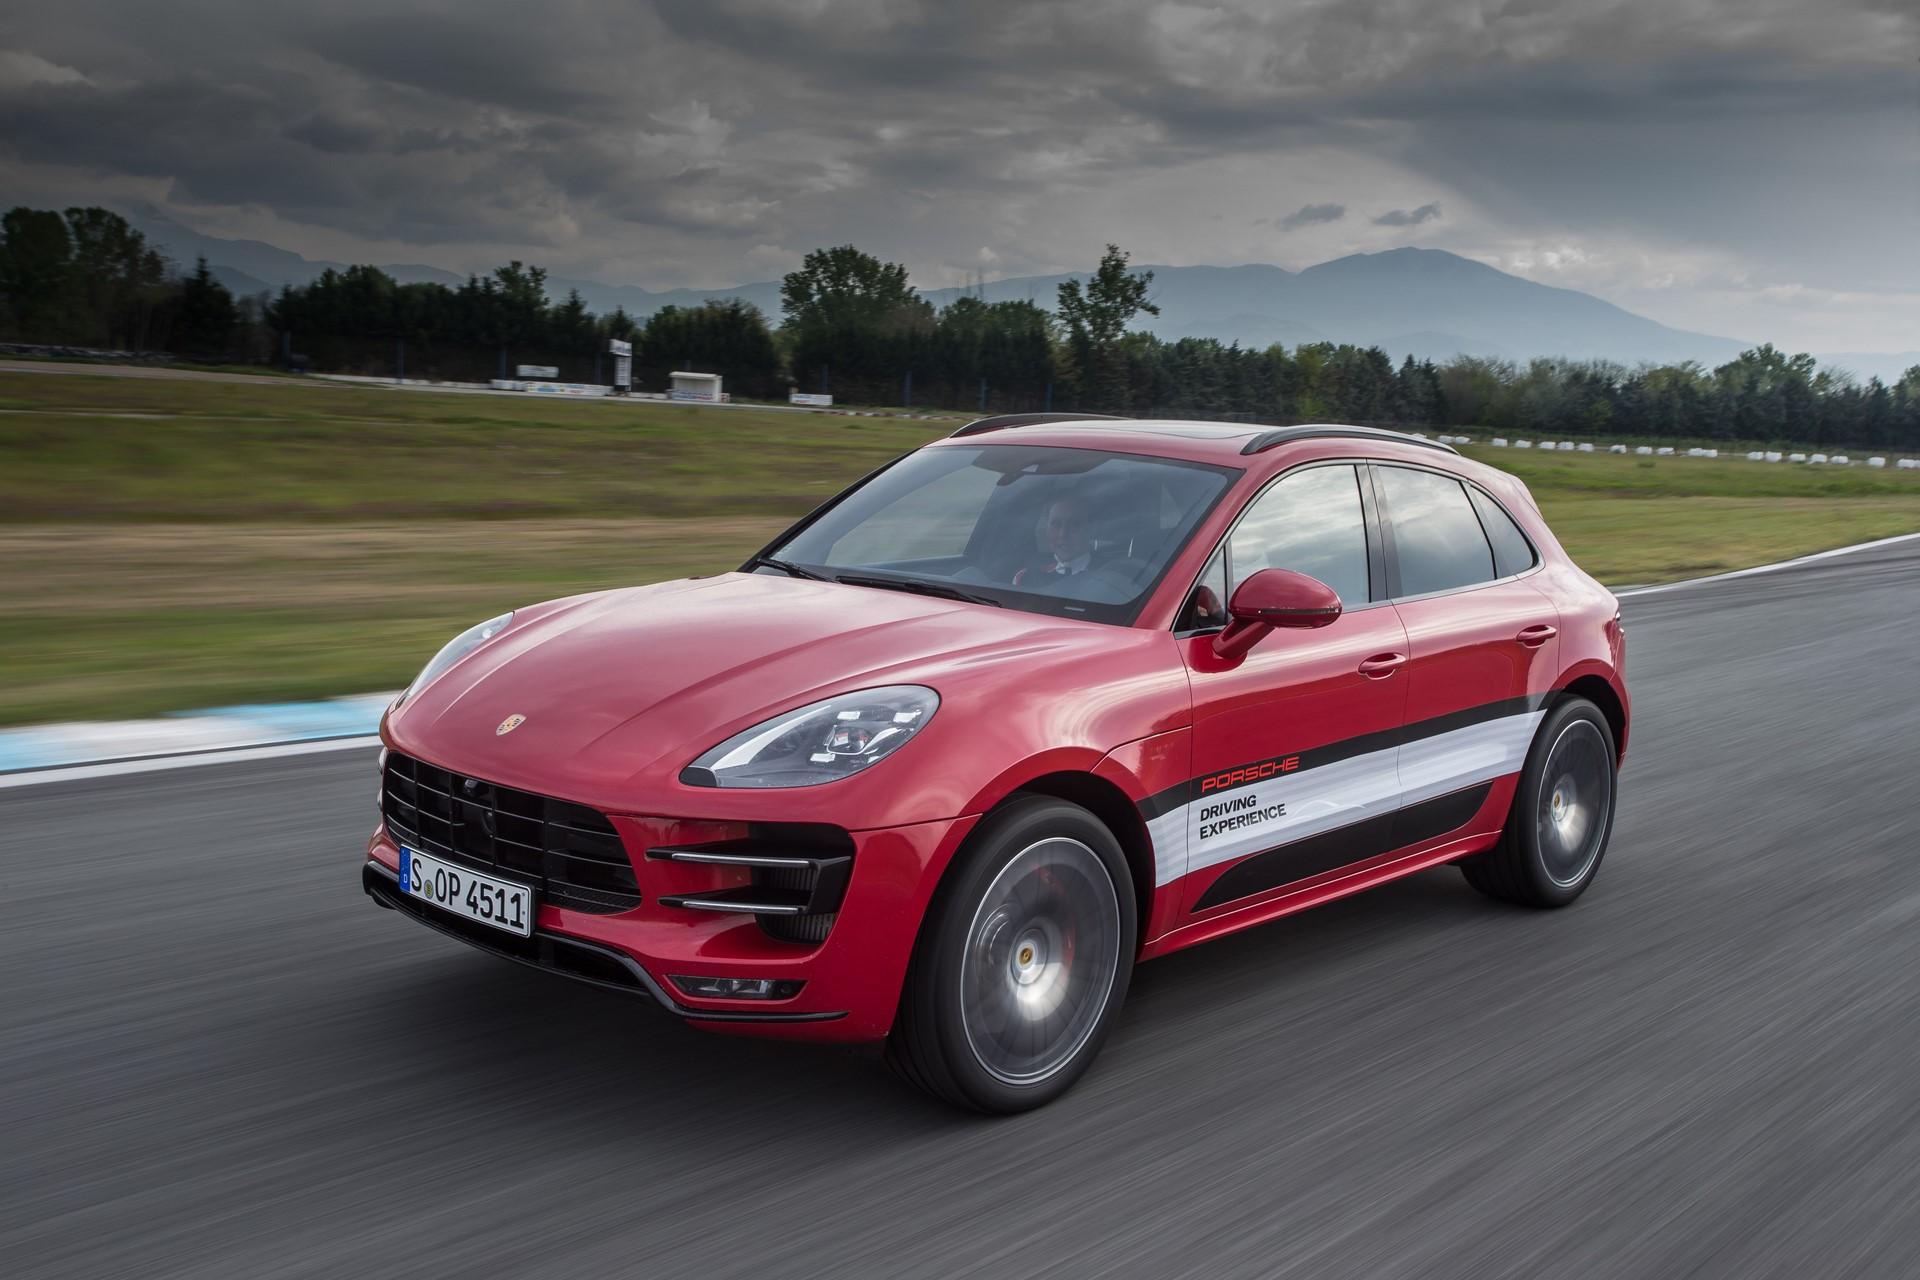 Porsche Driving Experience 2017 Serres (59)